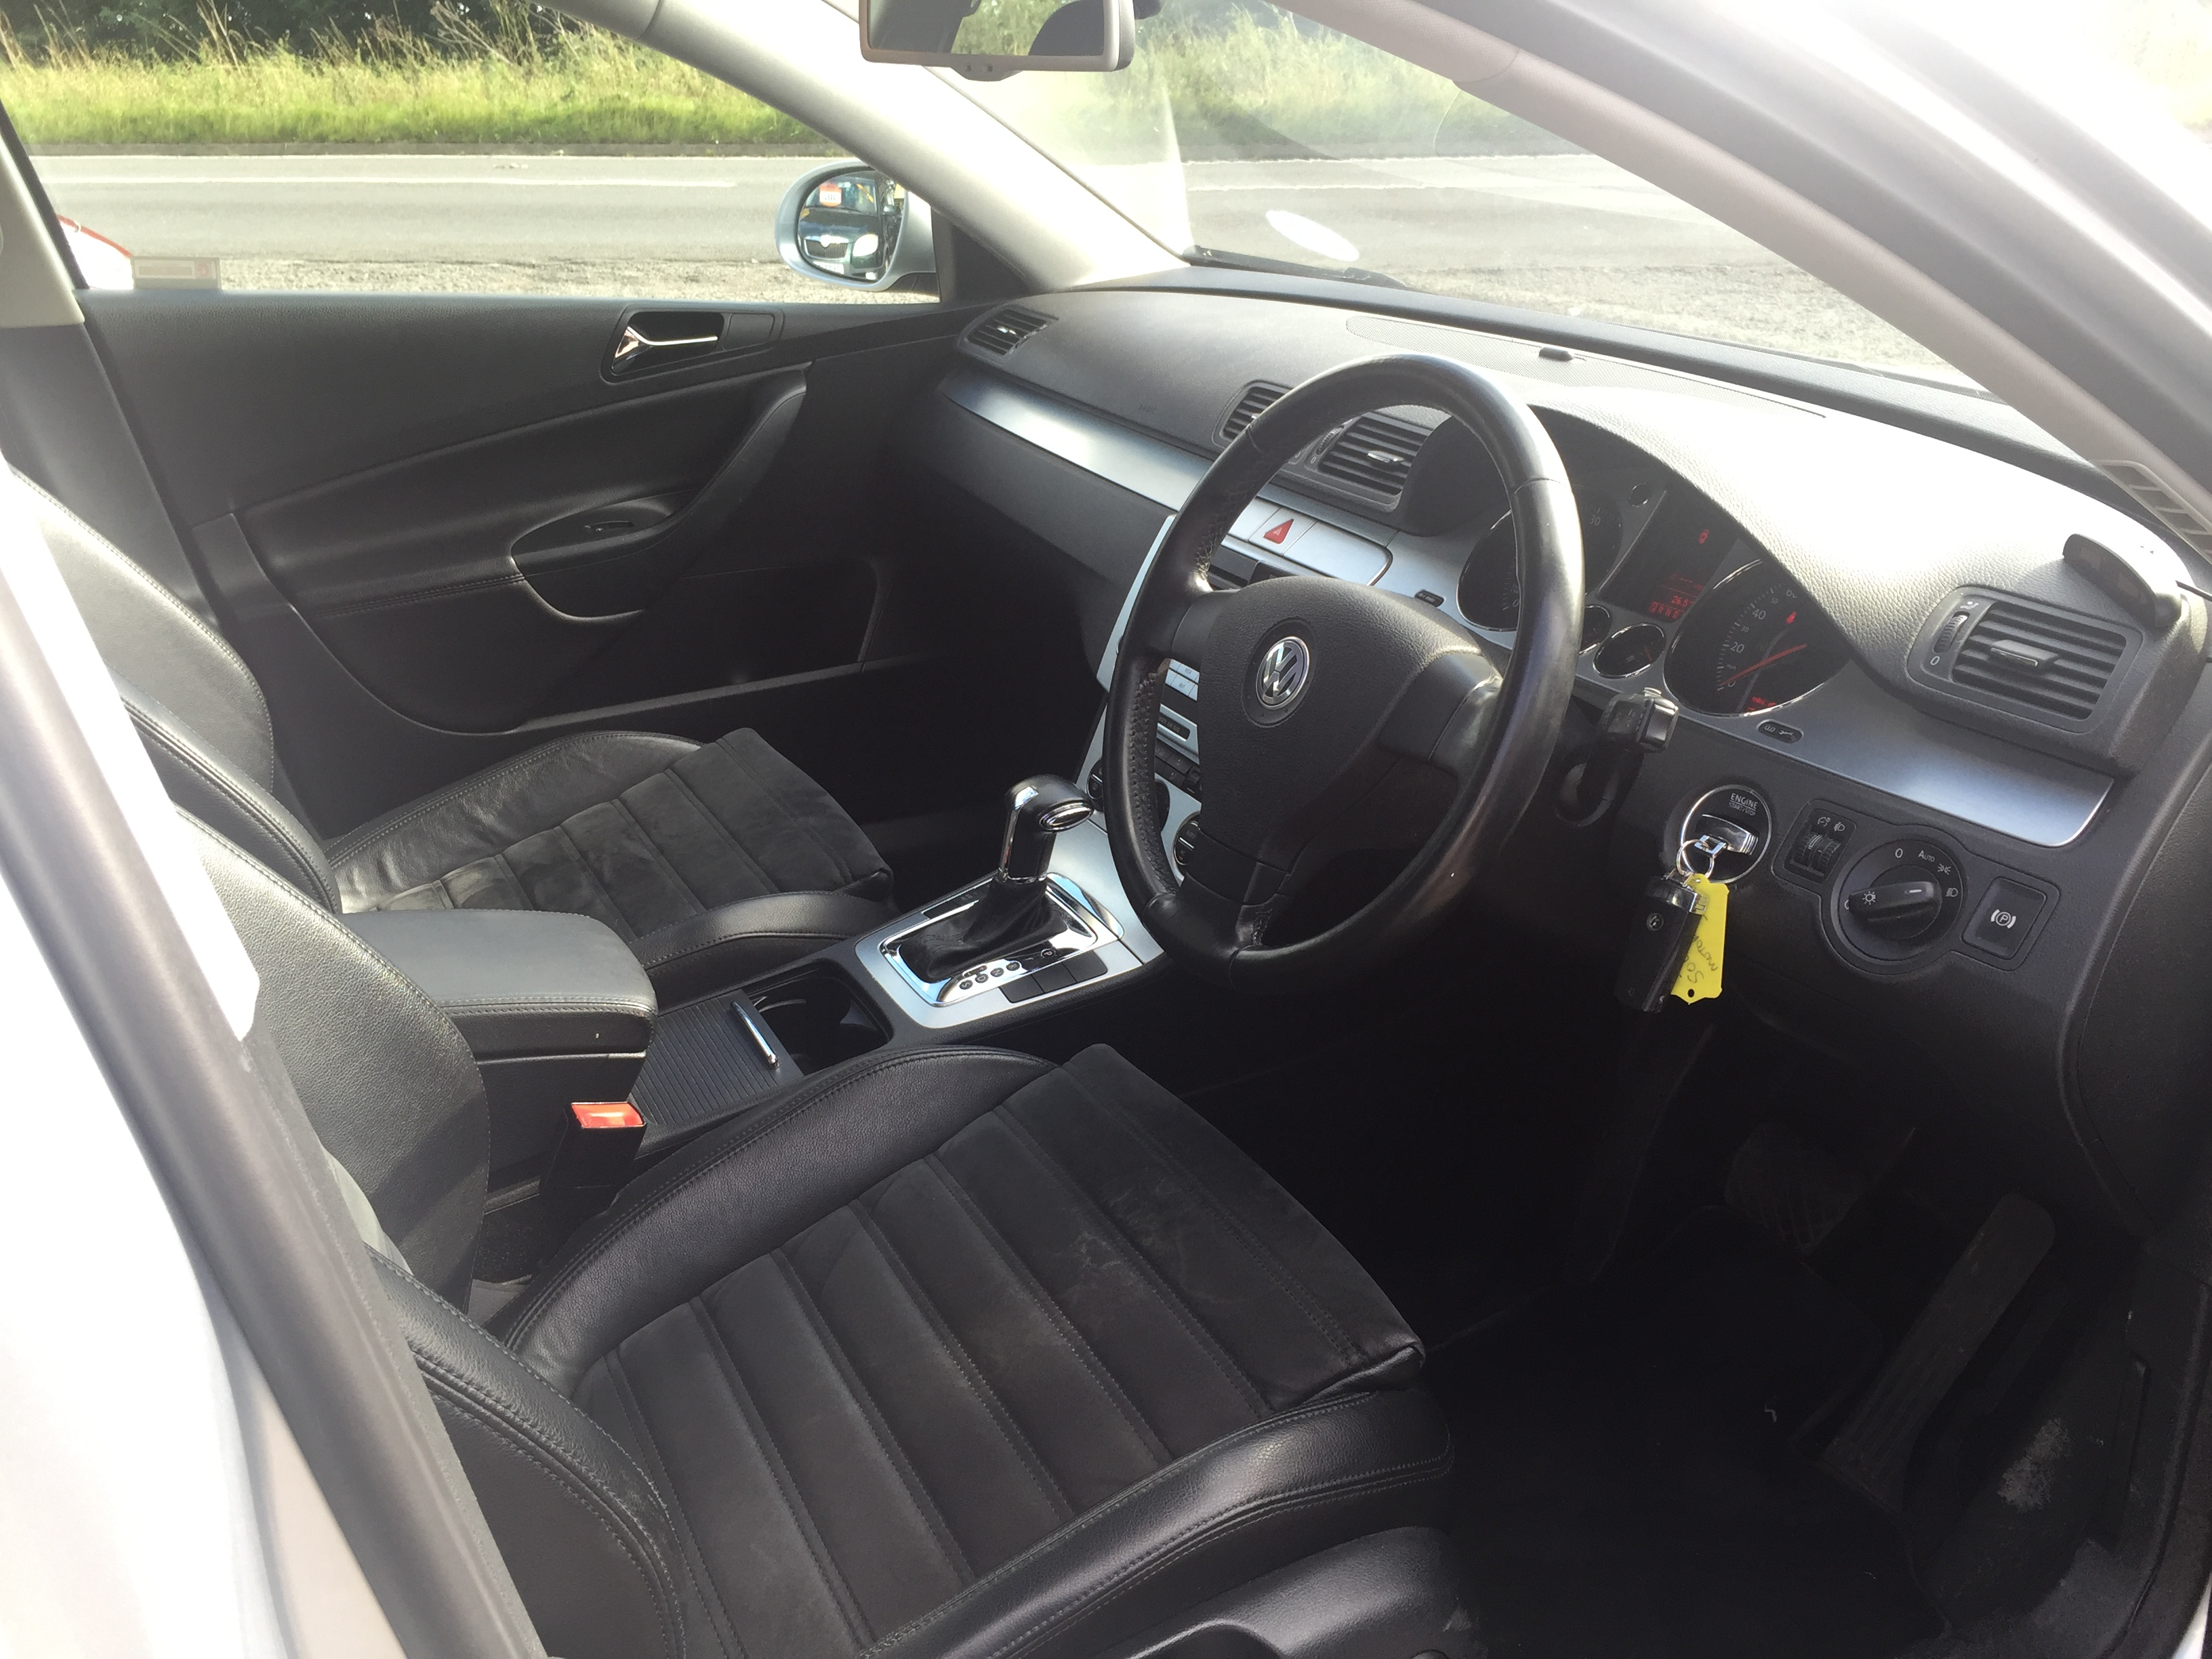 VW Passat 2.0TDI DSG 2008 Top Spec